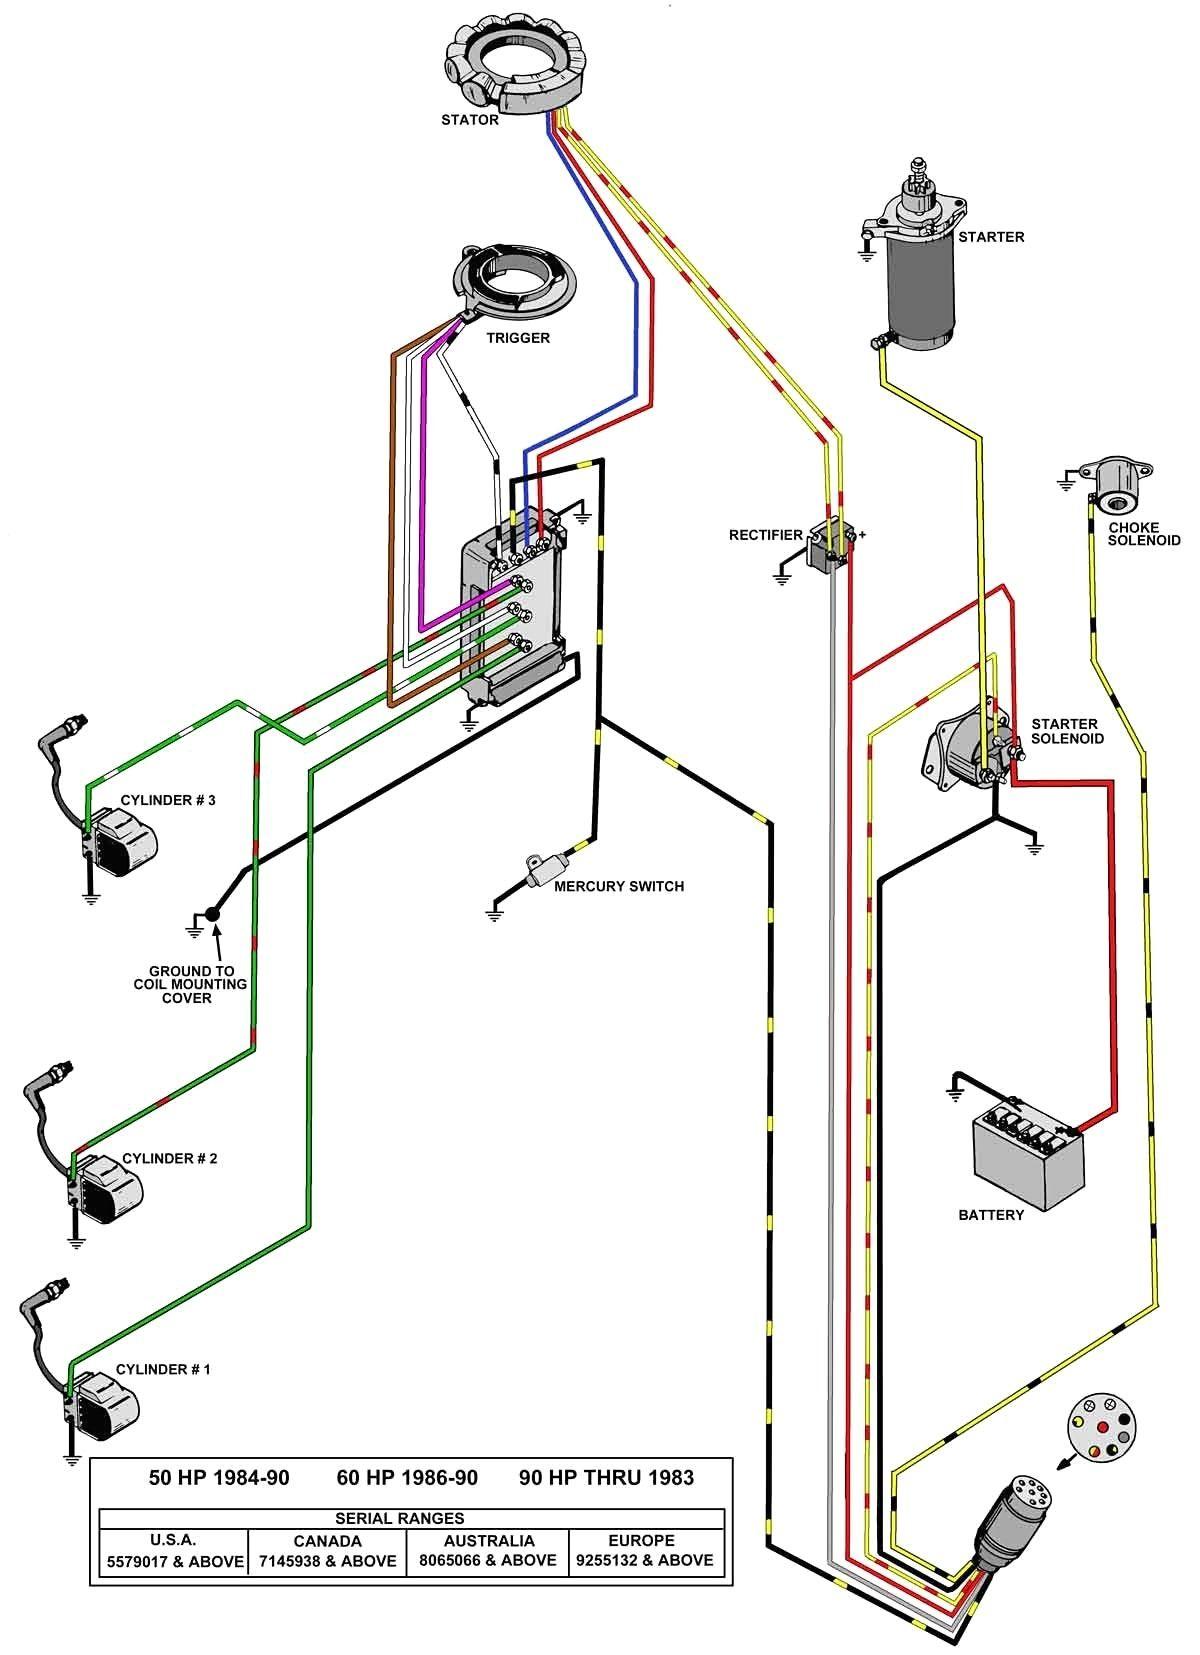 Mercury Marine Ignition Switch Wiring Diagram | Wiringdiagram - Mercury Outboard Ignition Switch Wiring Diagram